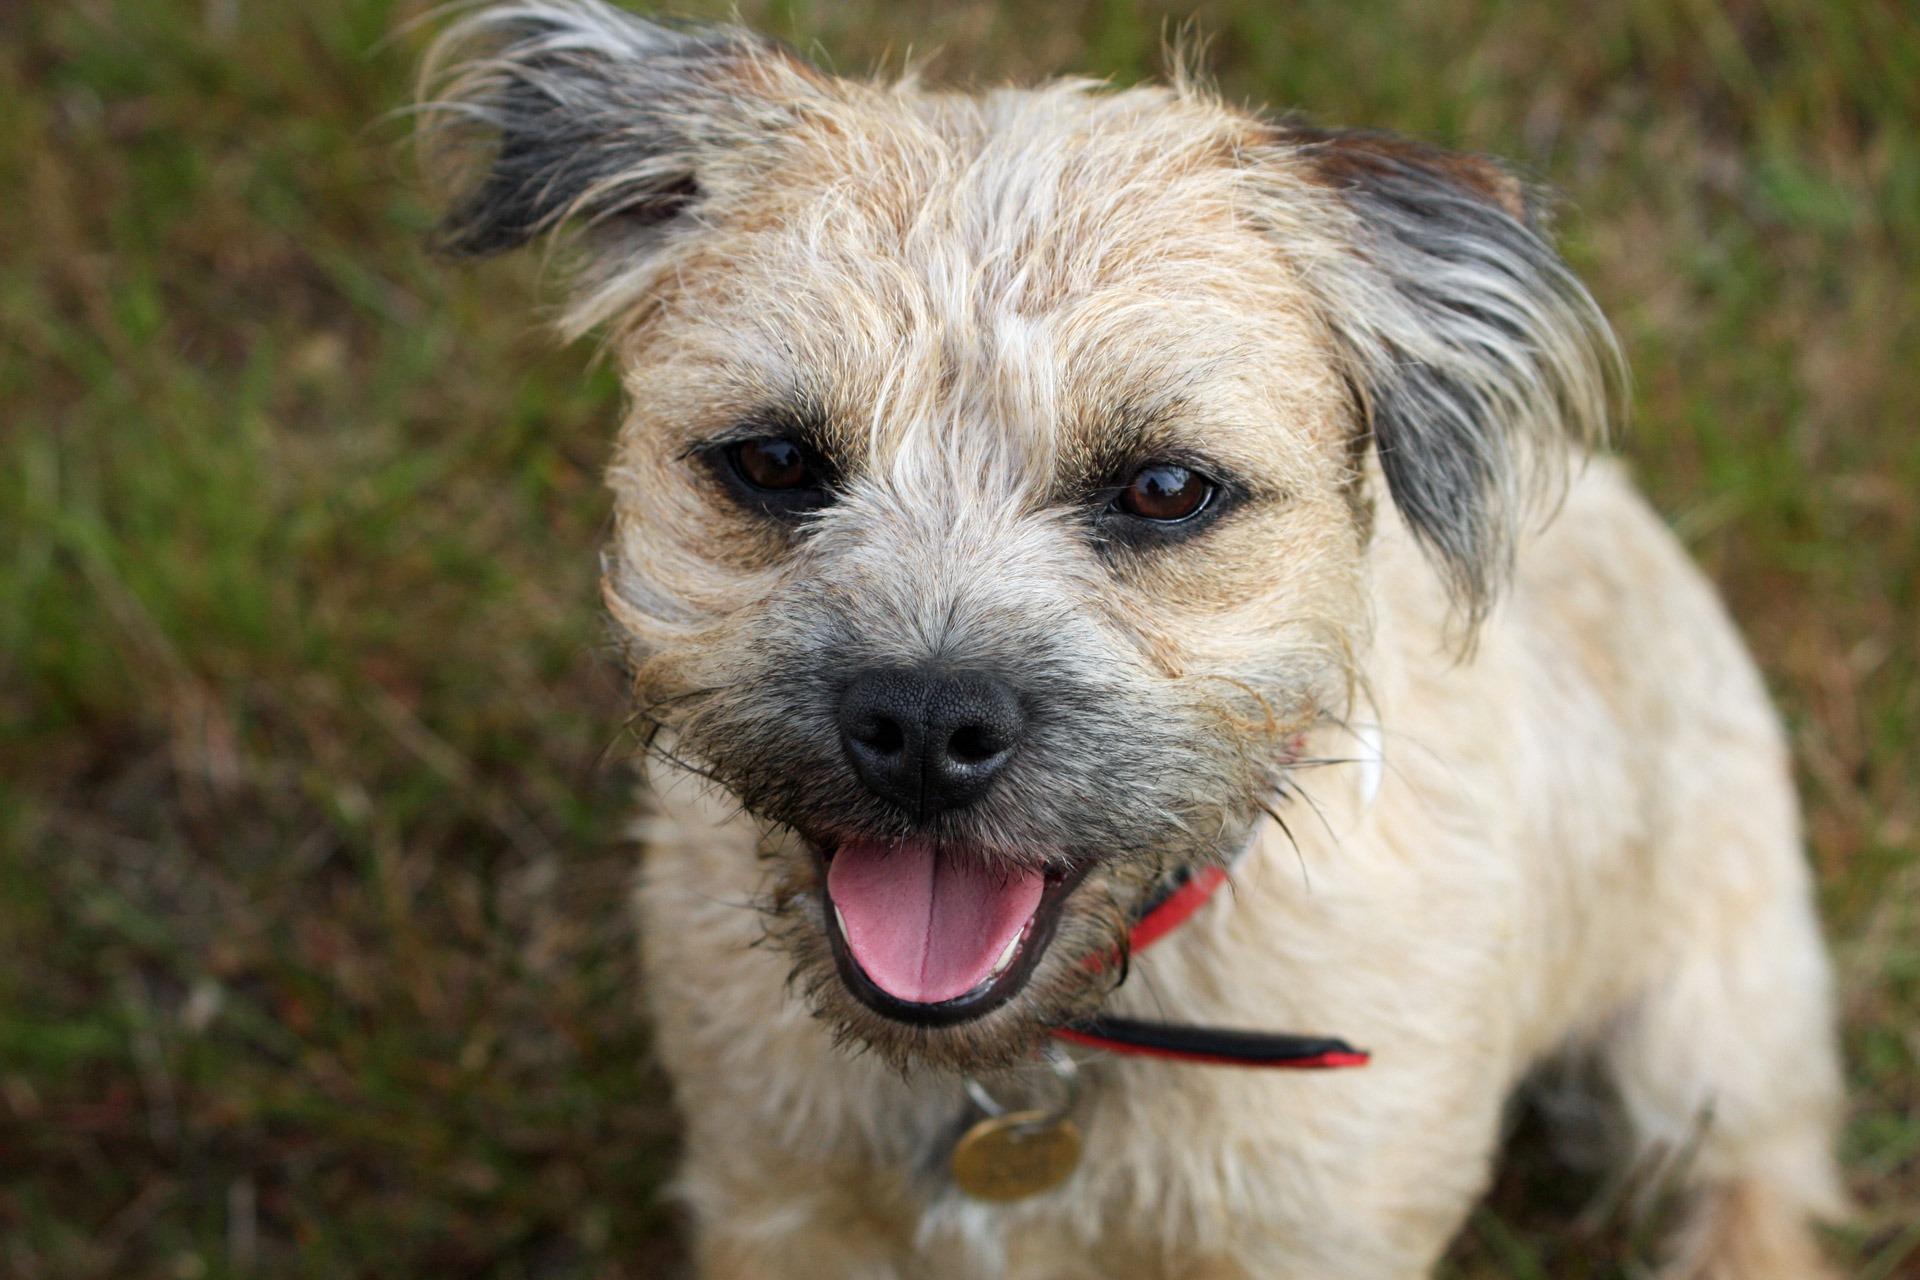 Free Images Puppy Animal Cute Canine Photo Pet Portrait